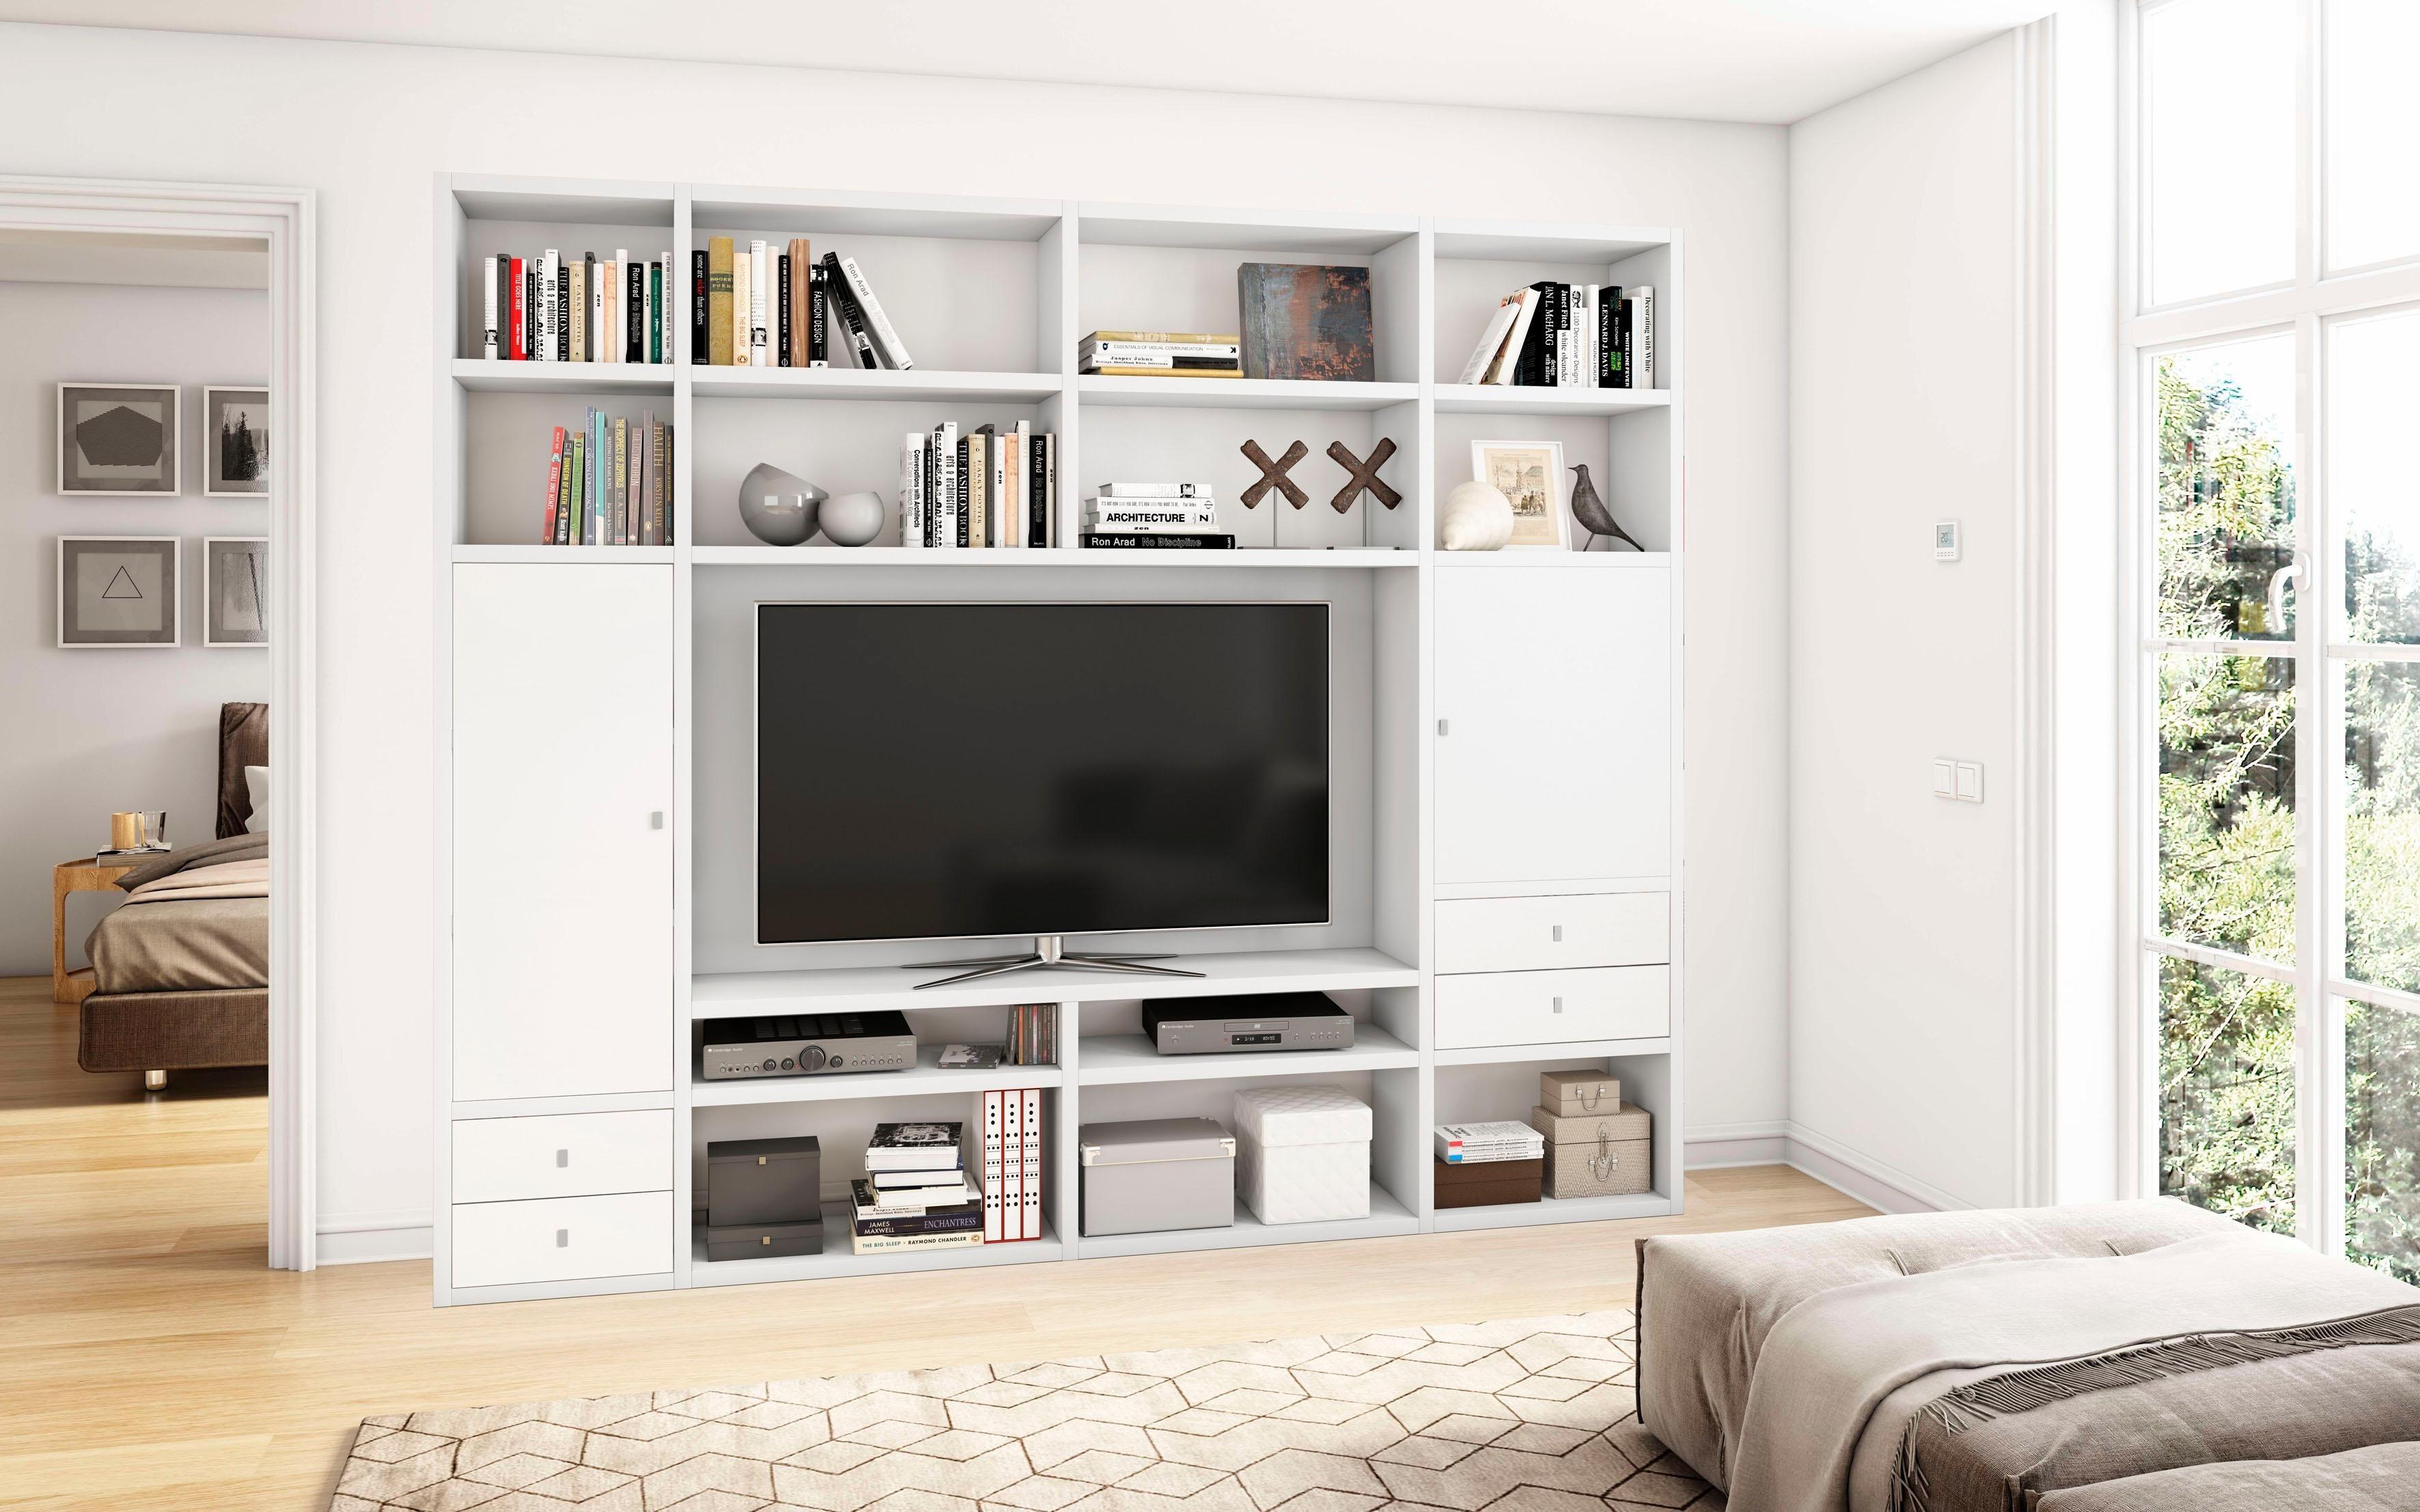 wohnwand hochglanz creme good cheap wohnwand serrano in pinie crema with wohnwand pinie with. Black Bedroom Furniture Sets. Home Design Ideas